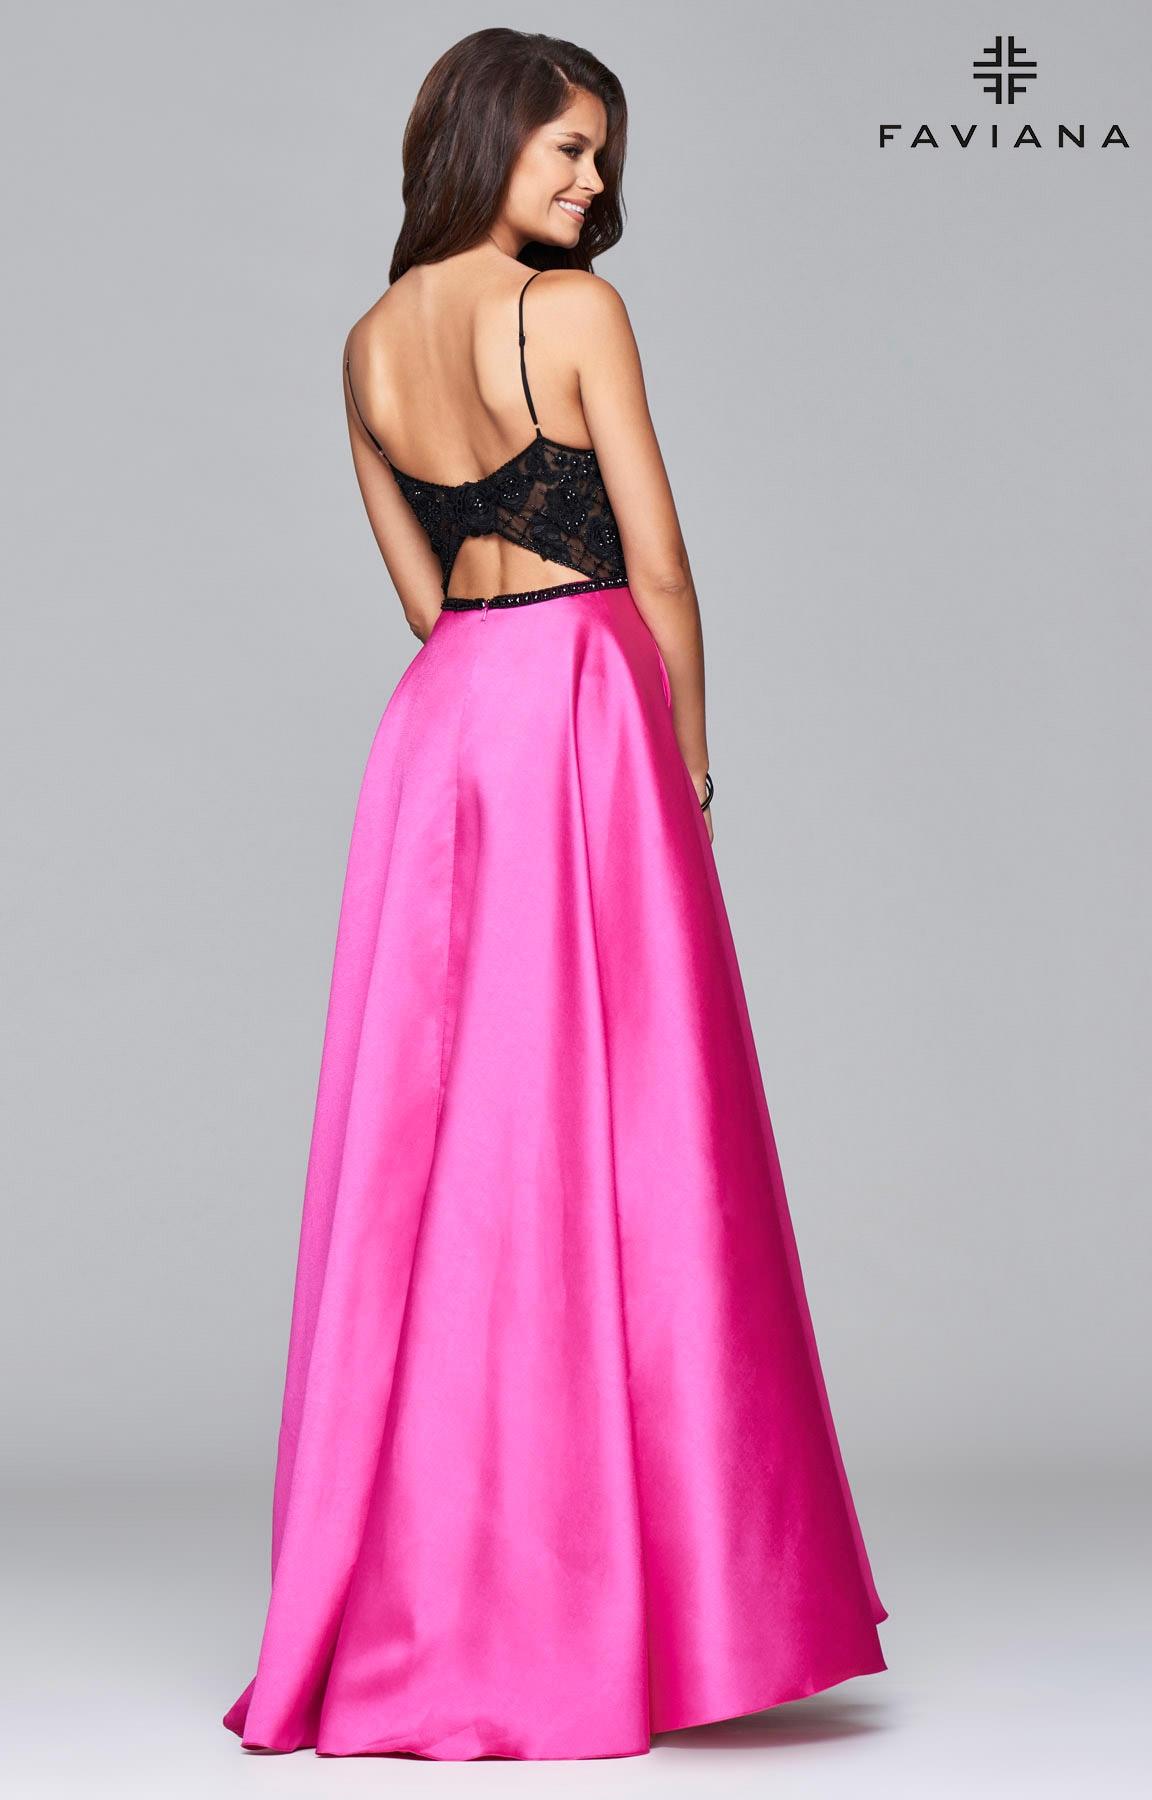 Faviana S7947 Skinny Strap Satin Ballgown Prom Dress